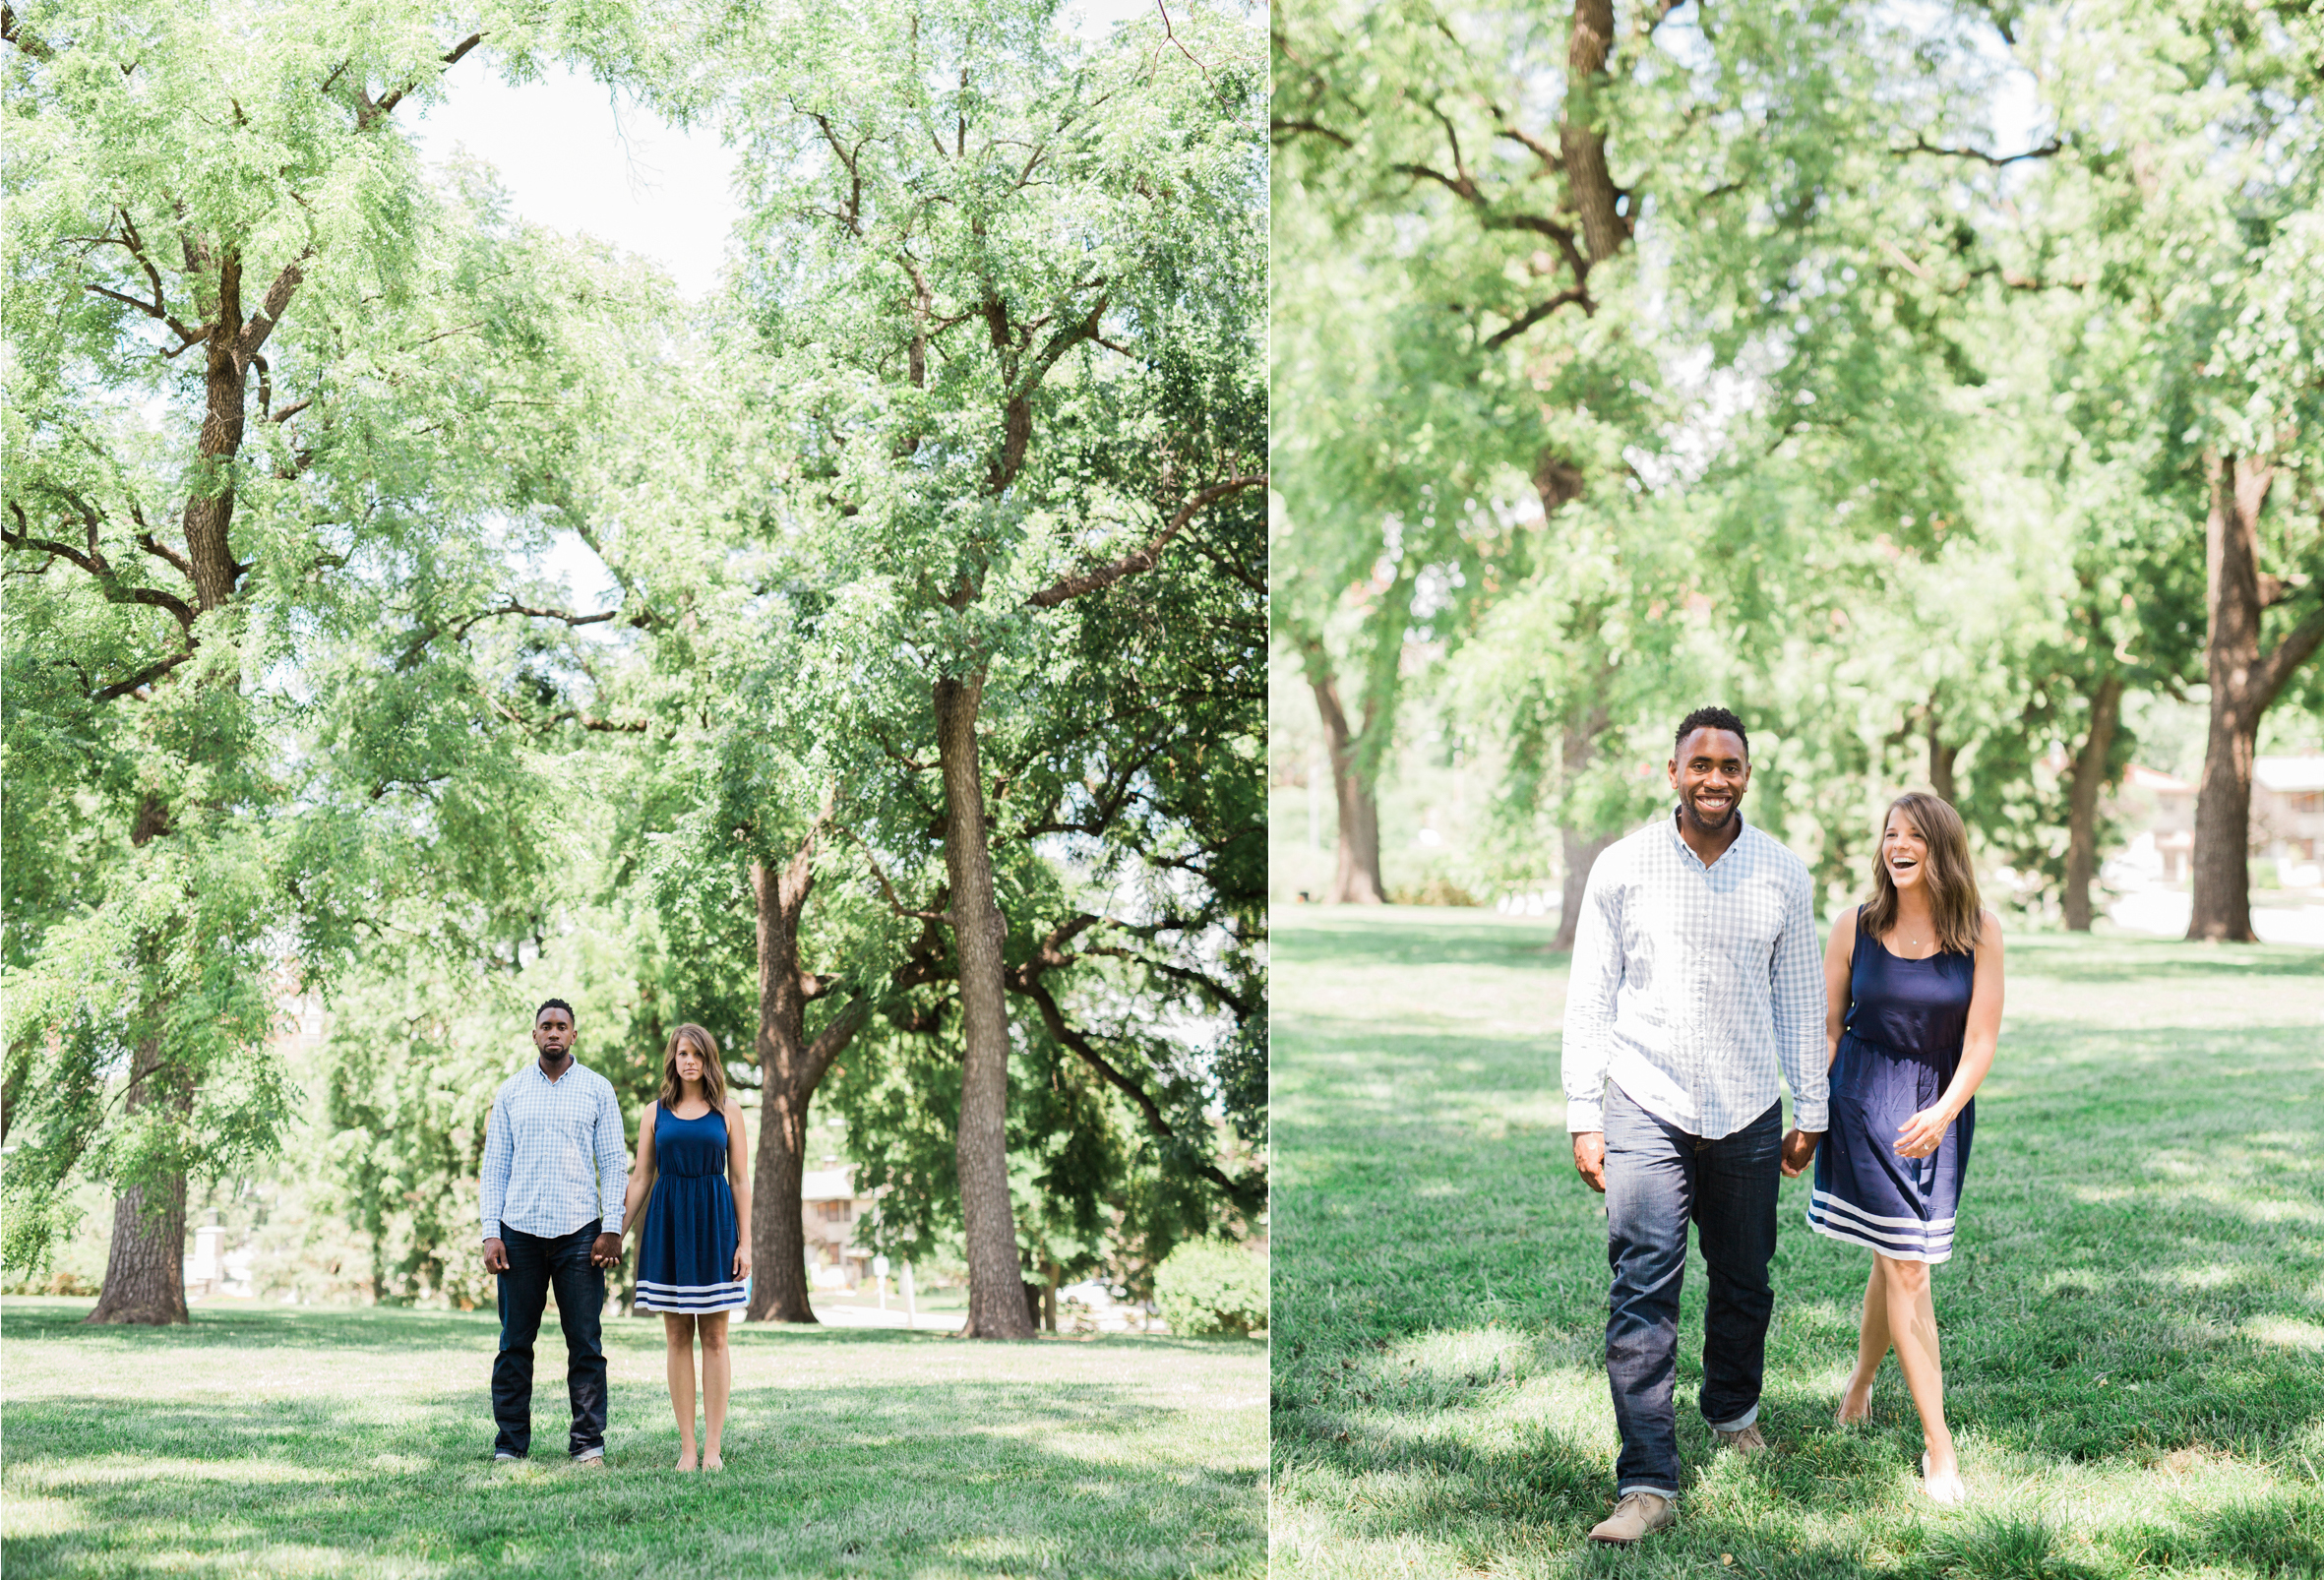 LegacyUnion-Wedding-Photographer-Glendale-CA-4 copy.jpg